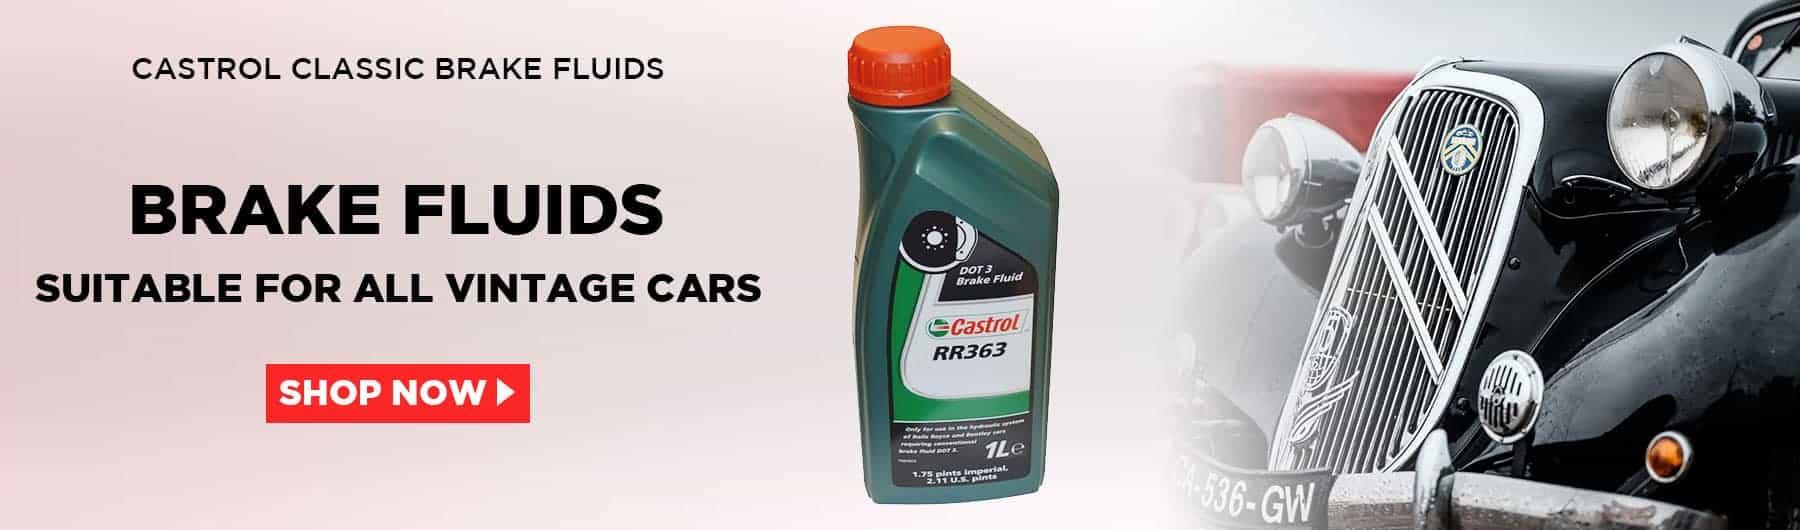 Castrol Classic Brake Fluids in Australia